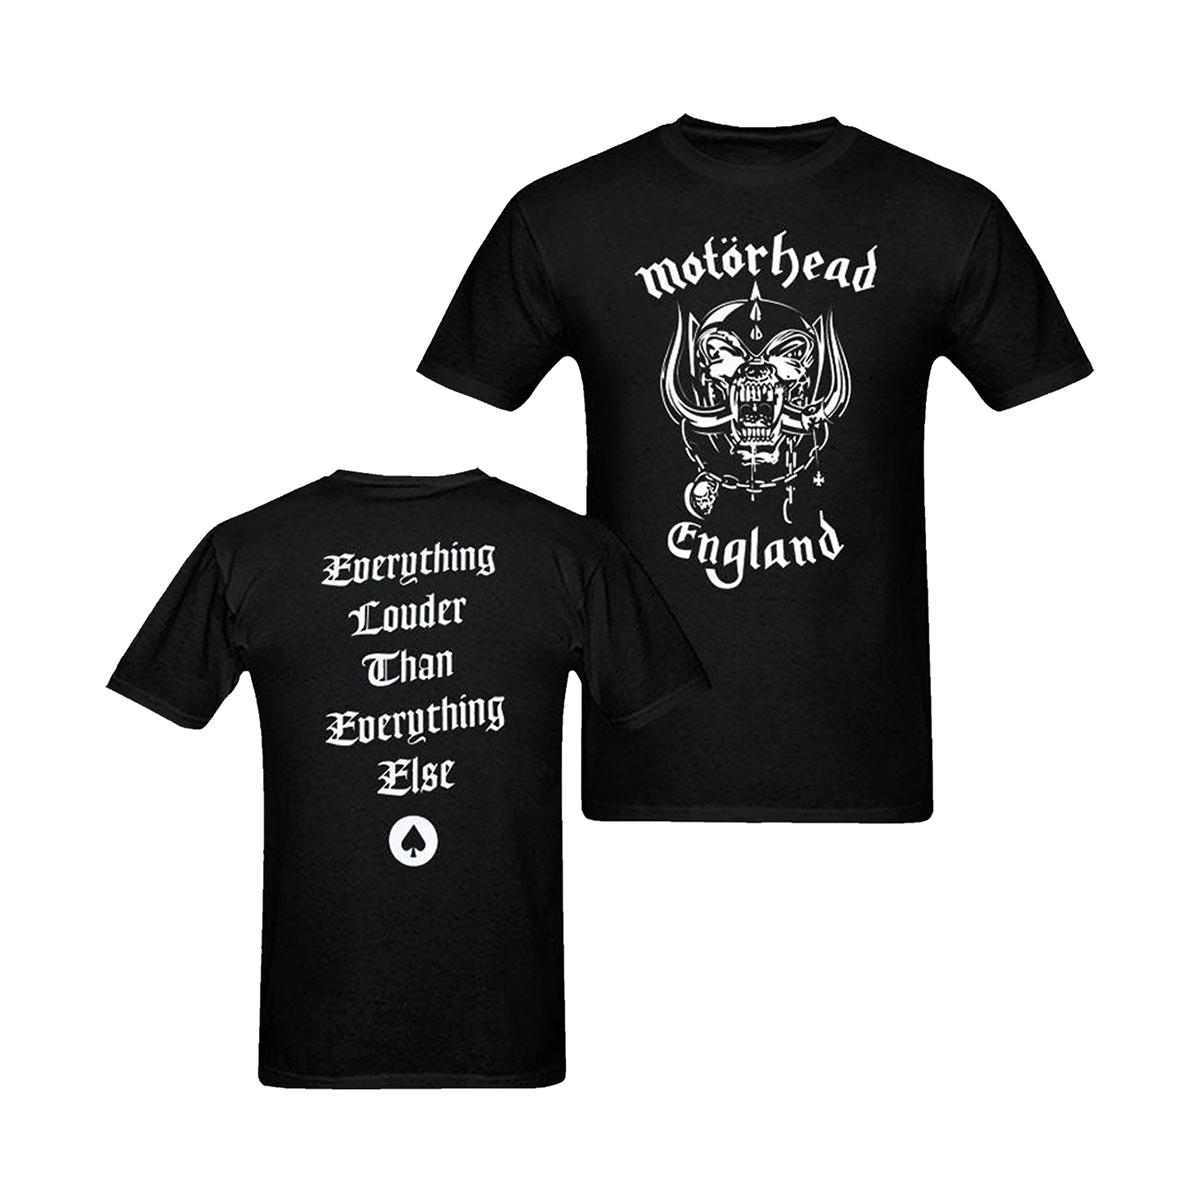 Motörhead EVERYTHING LOUDER T-SHIRT